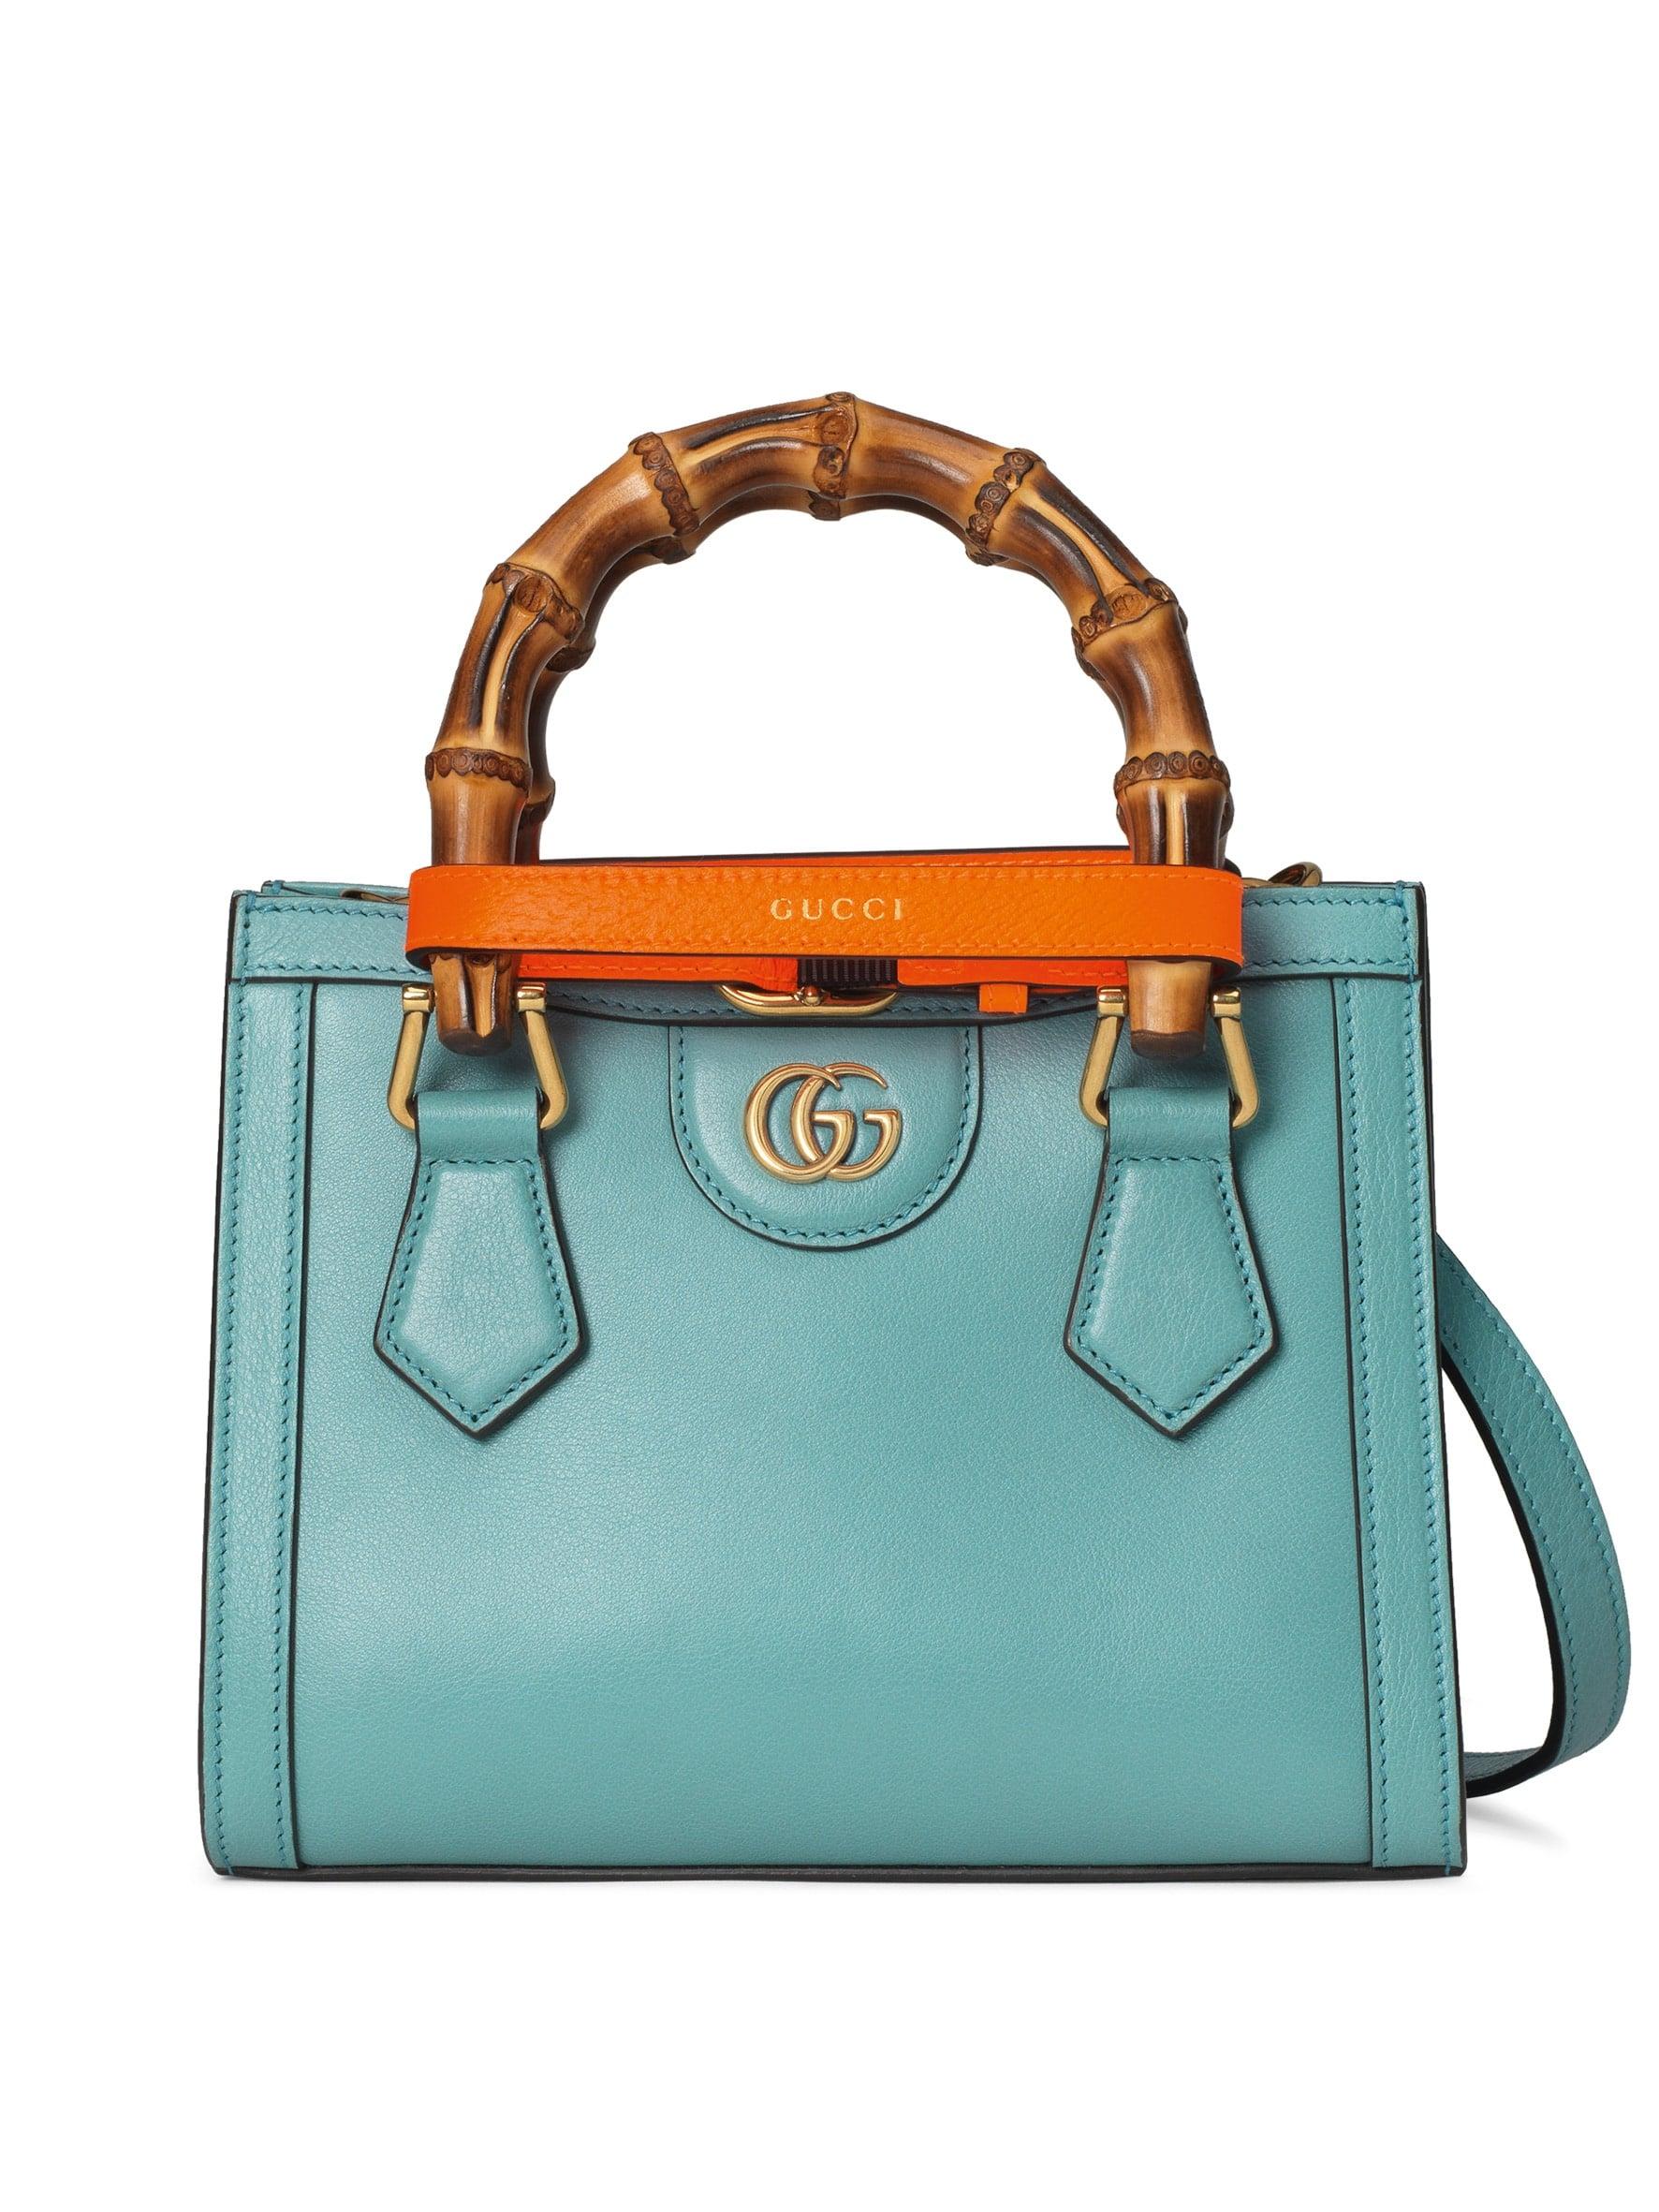 Gucci 'Diana' in poudre light blue